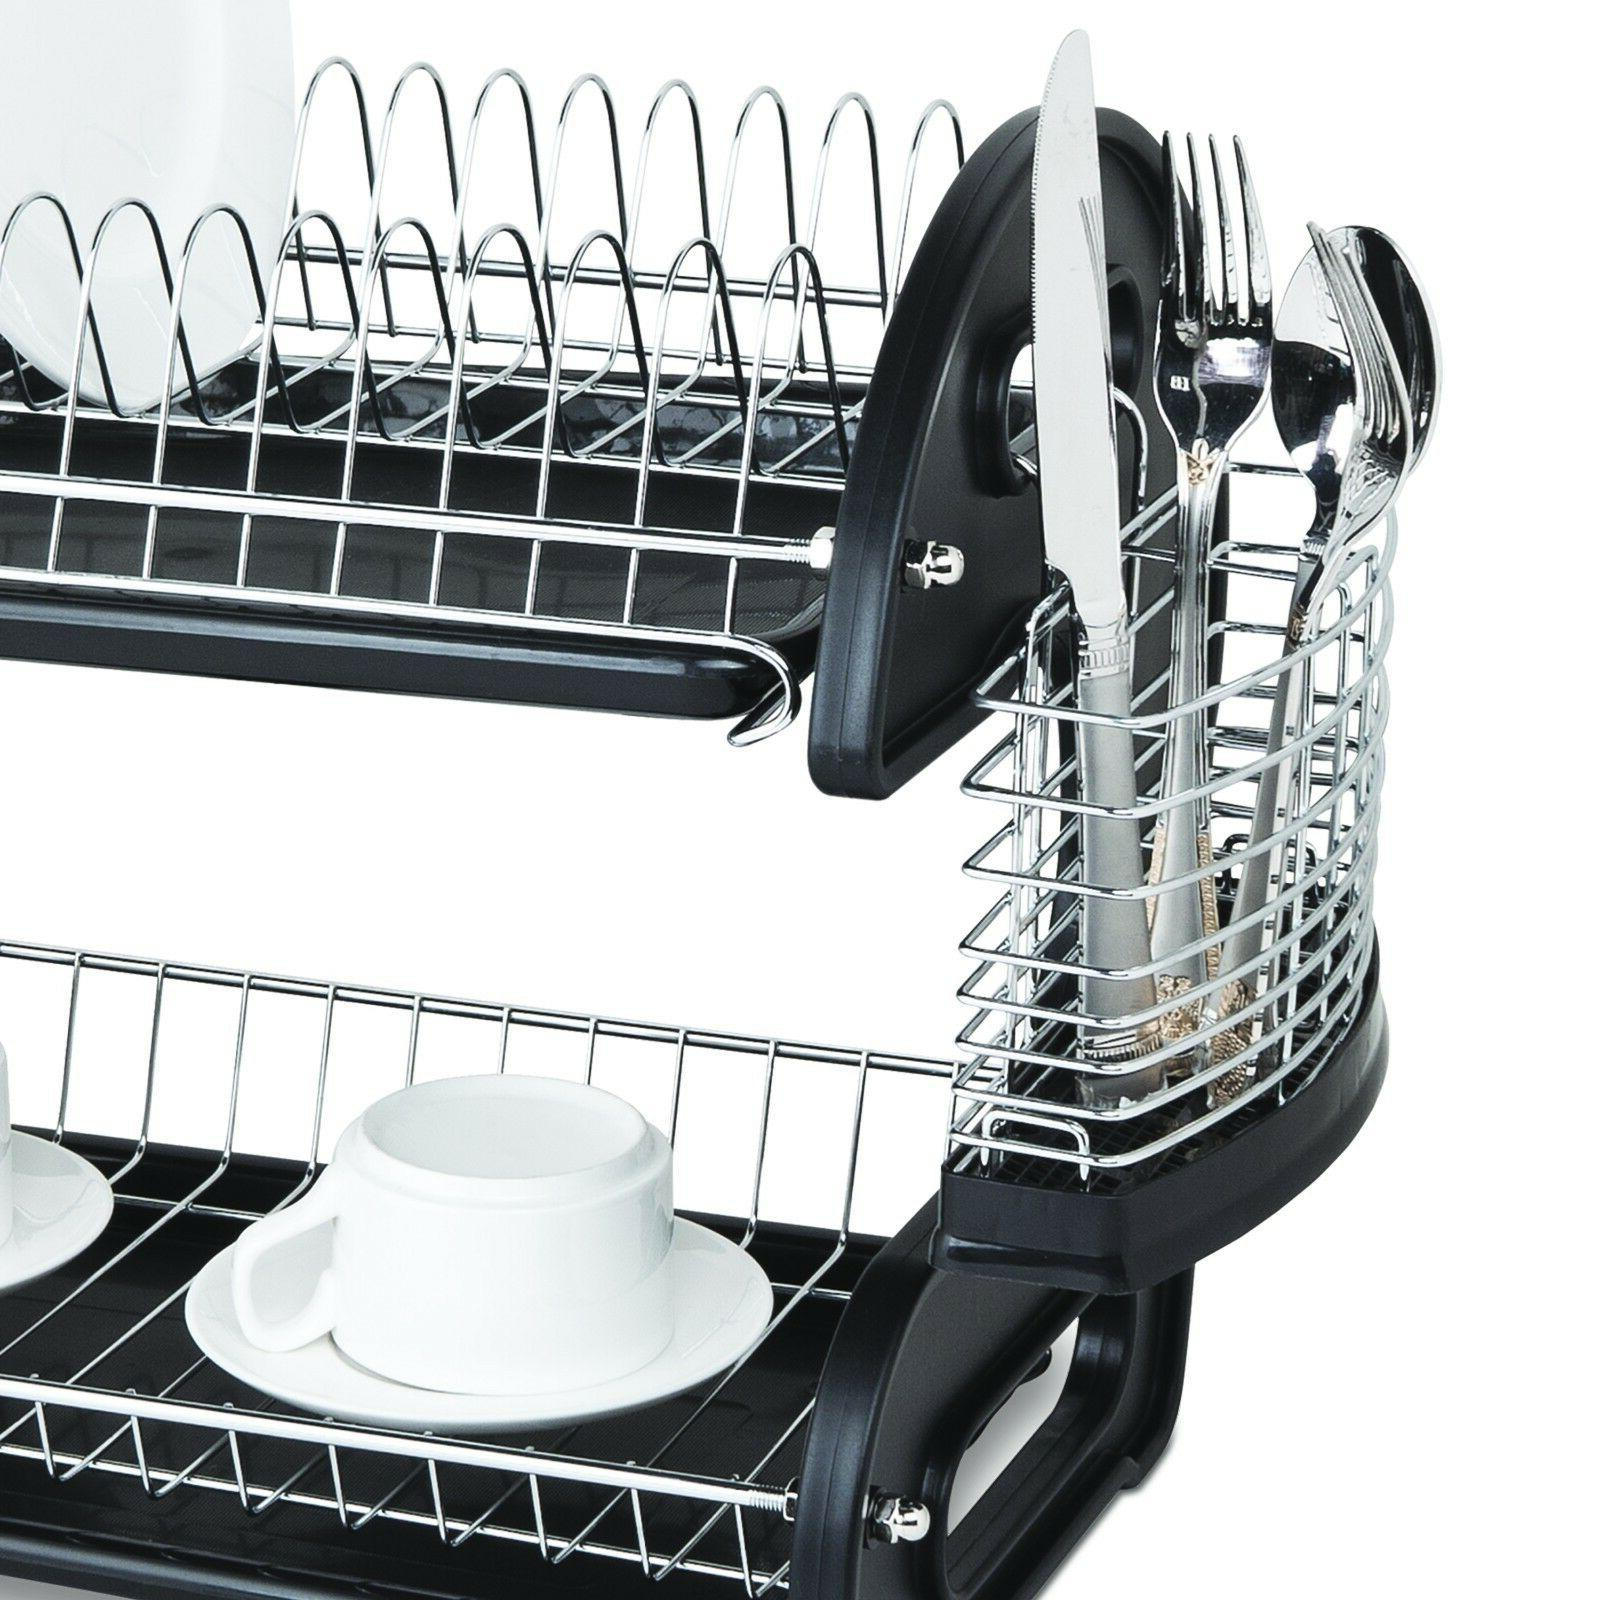 Home Basics 2 Tier Black Drying Washing DD10249